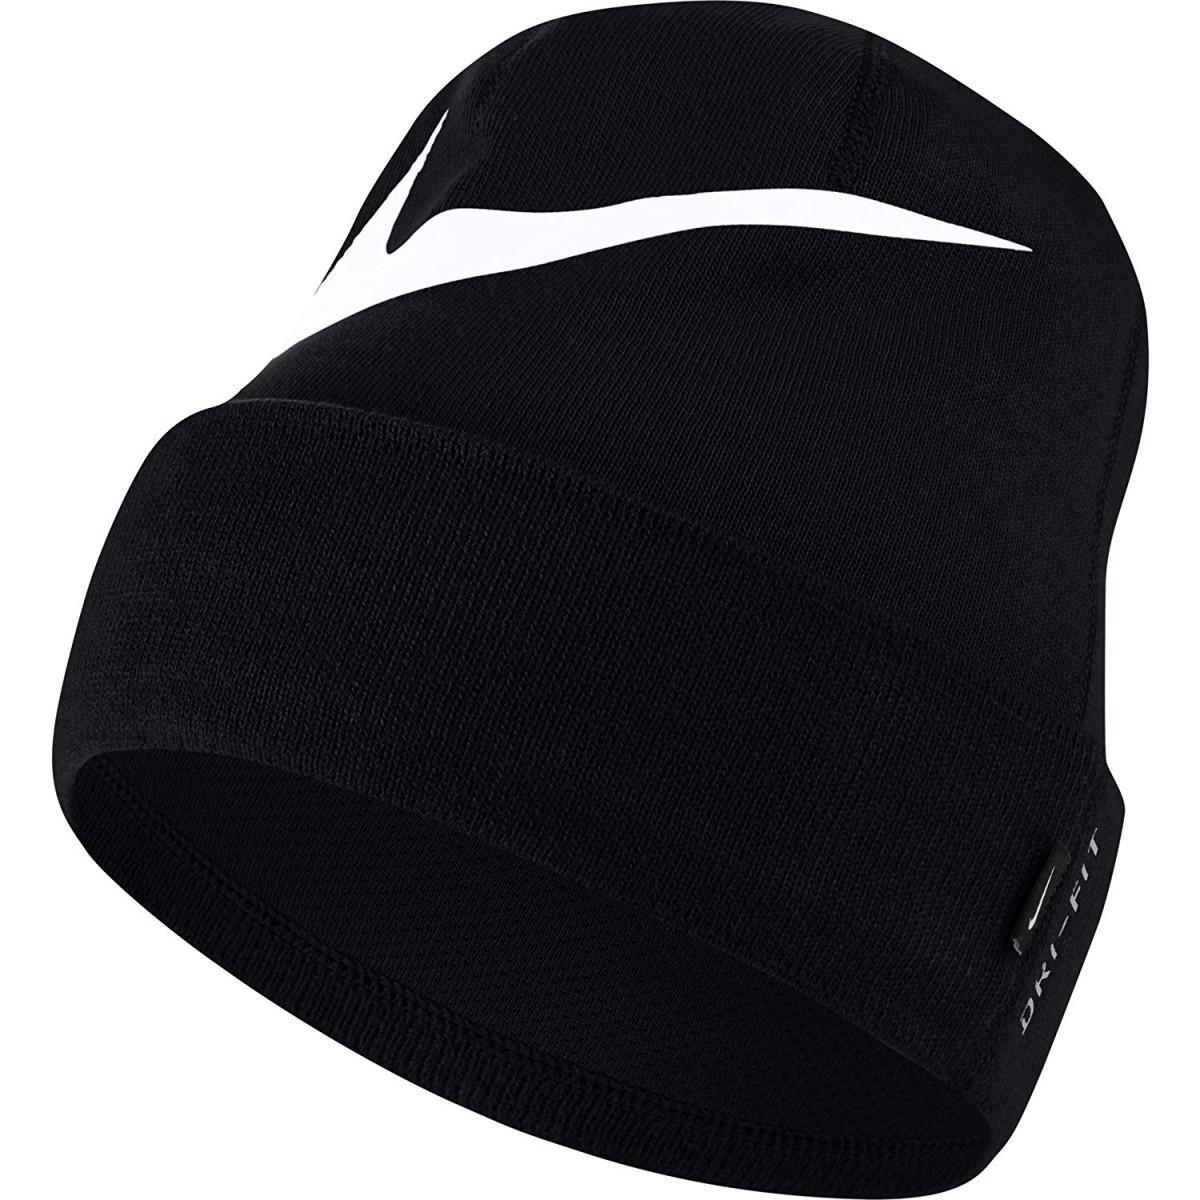 Спортивная шапка Nike Swoosh Cuffed Beanie black/white